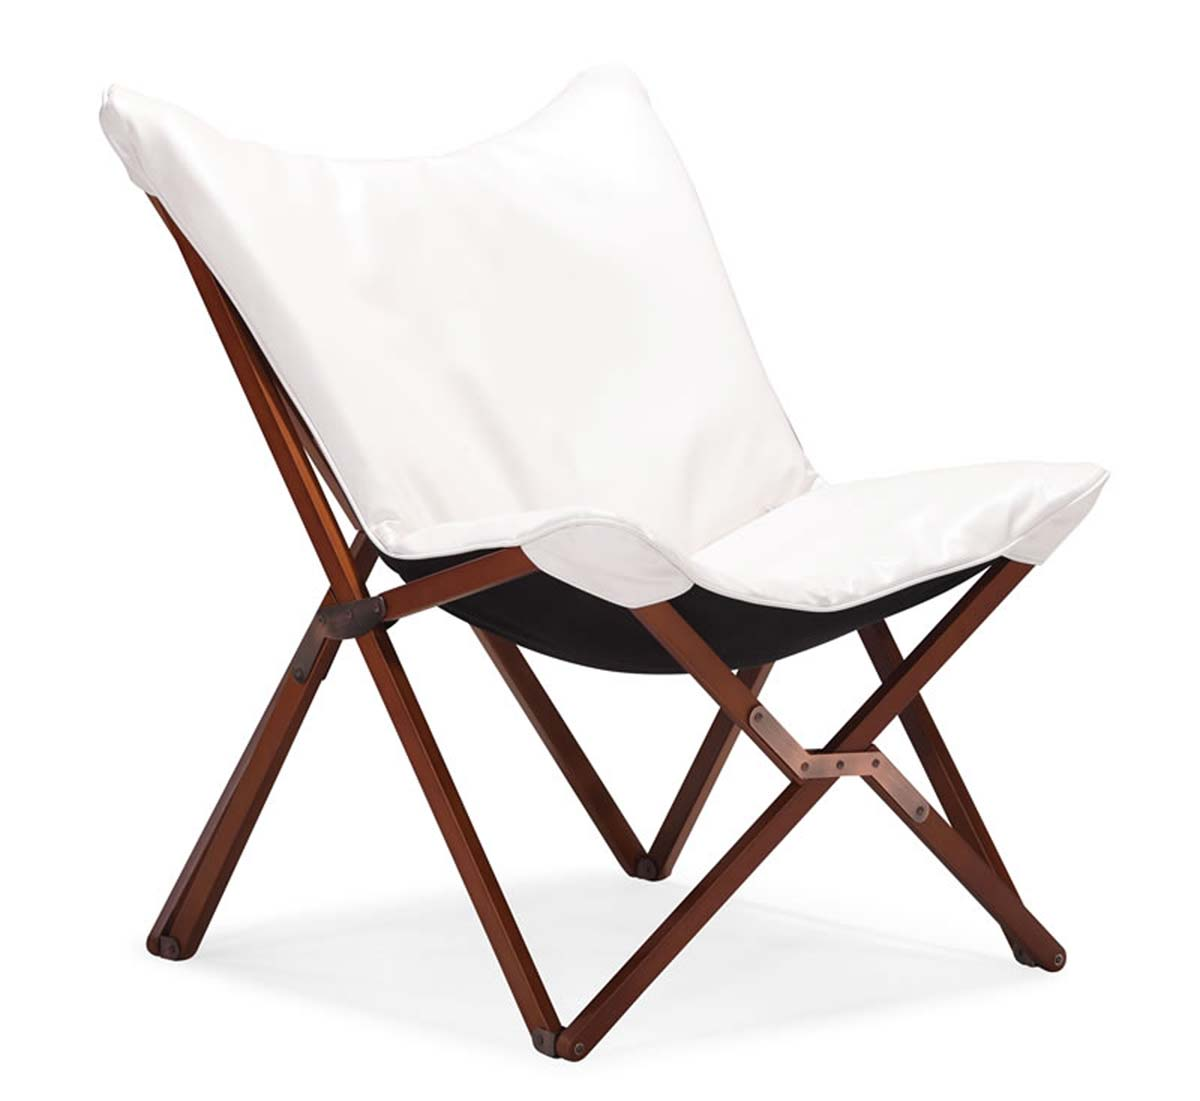 Zuo Modern Draper Lounge Chair - White